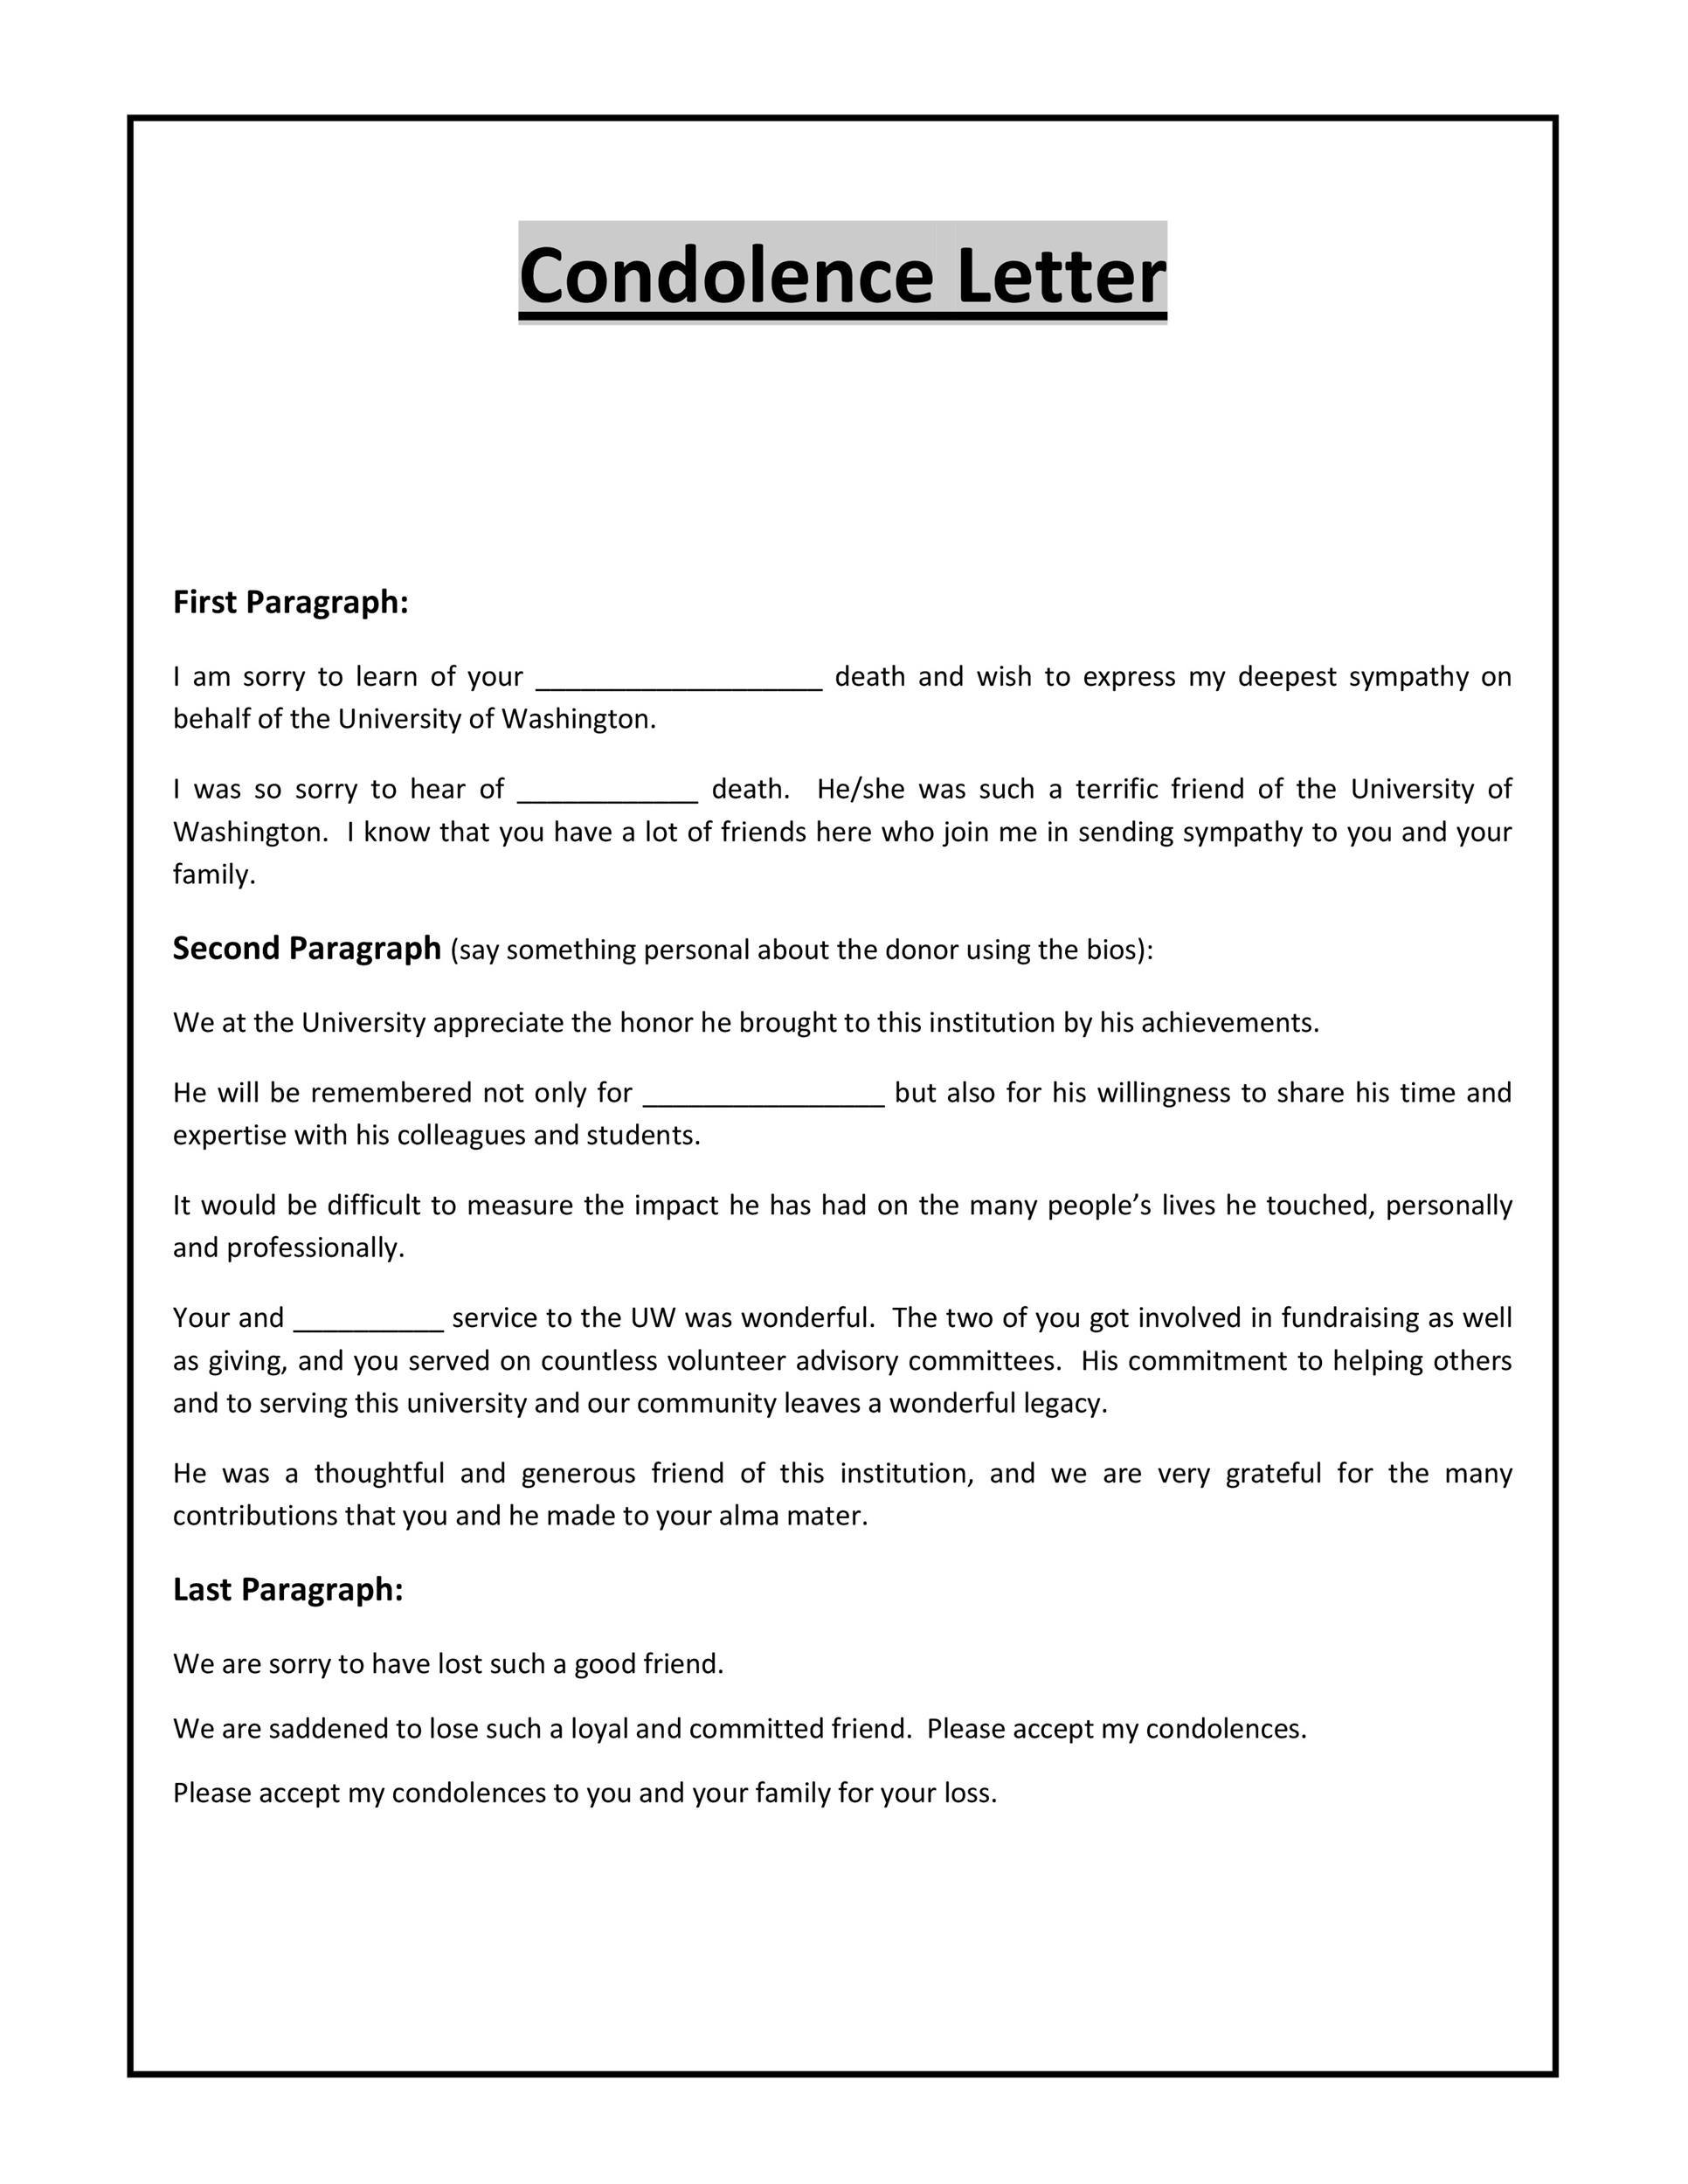 Condolence Letters